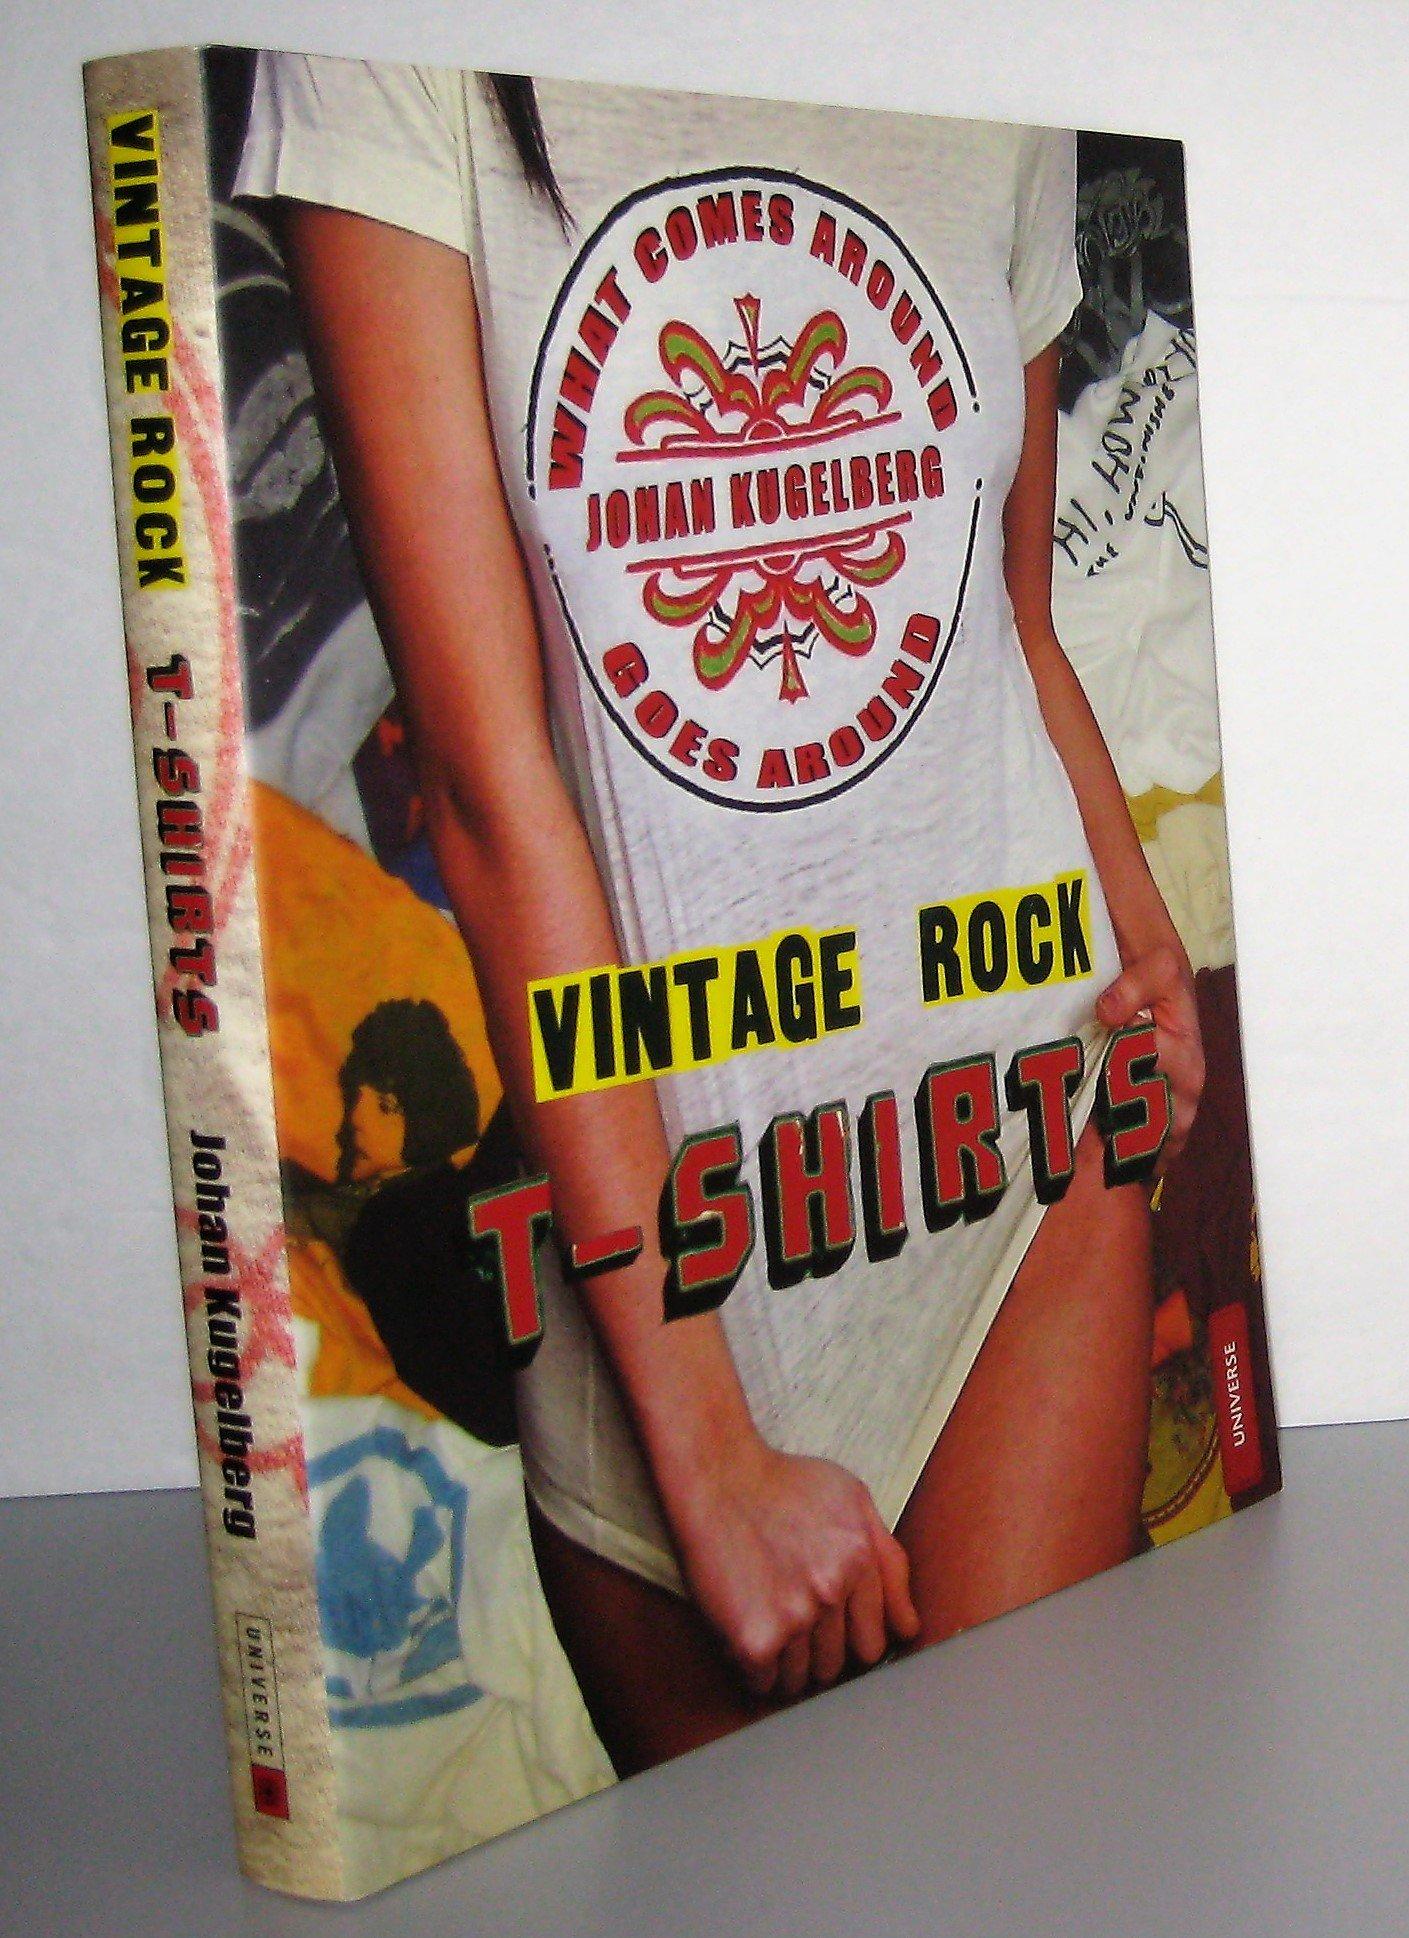 Vintage Rock T-Shirts ebook